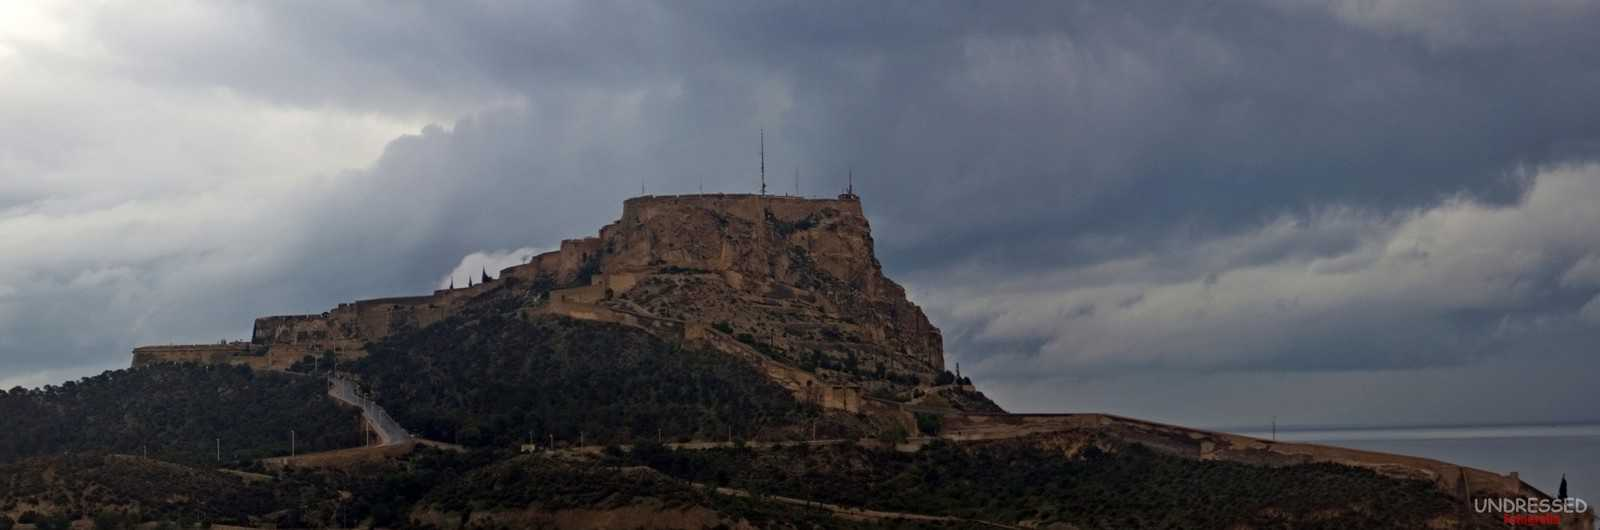 1418756170_Castillo de Santa Bárbara